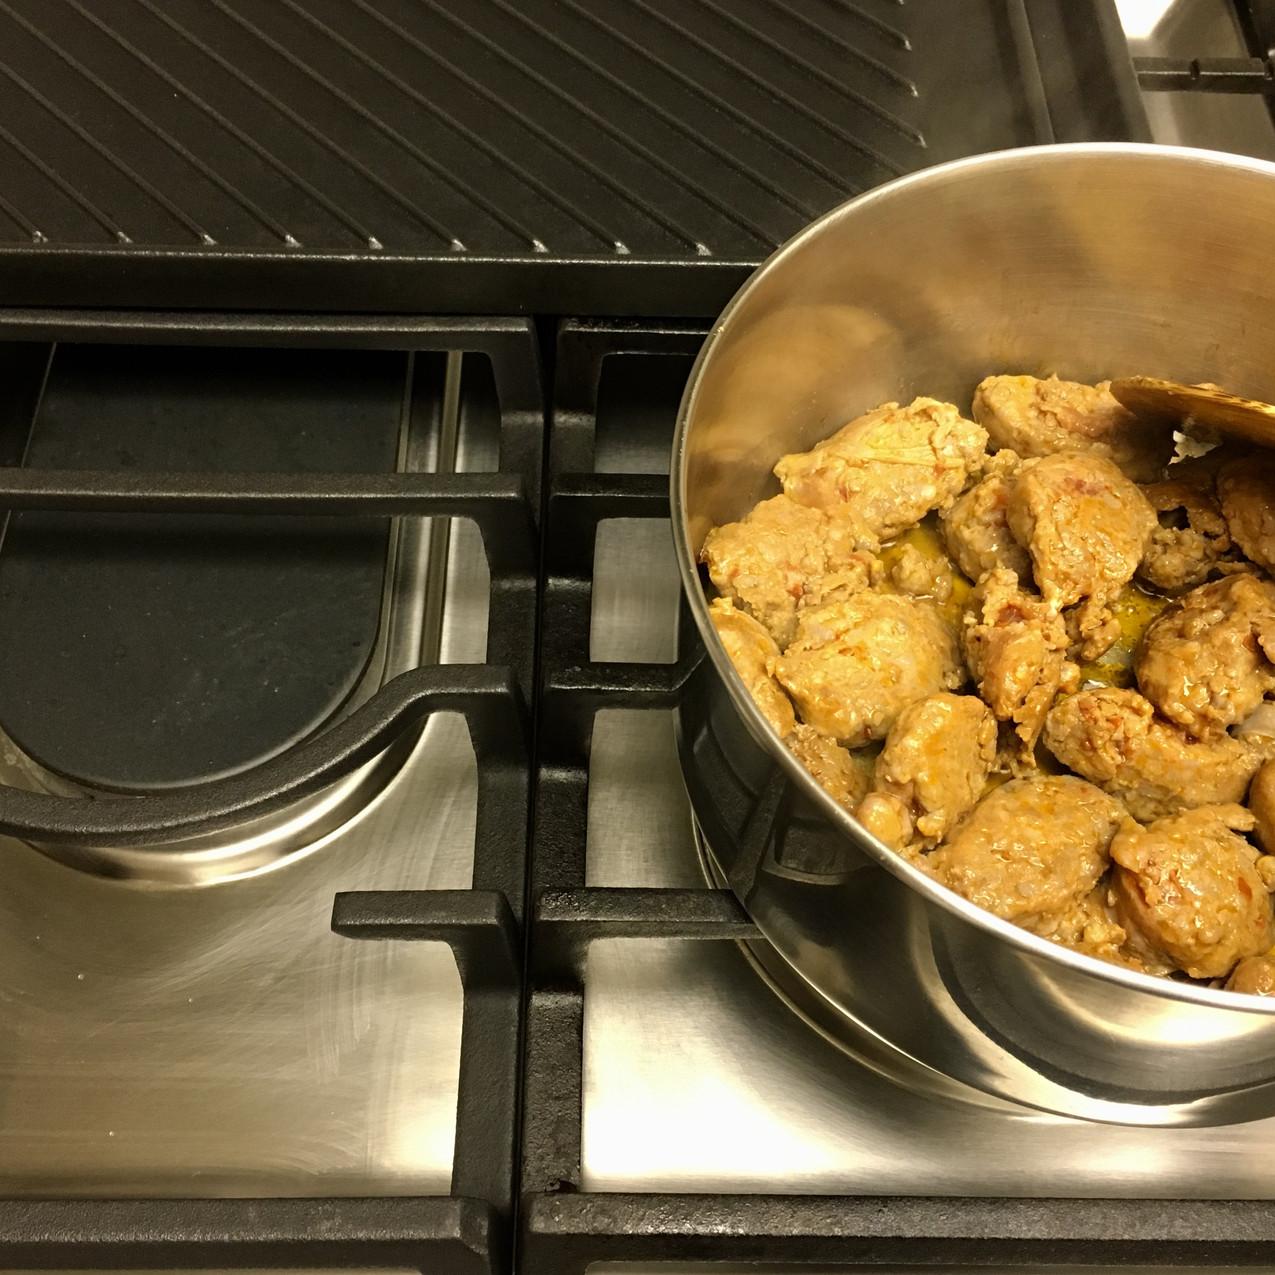 Cook over medium-high heat